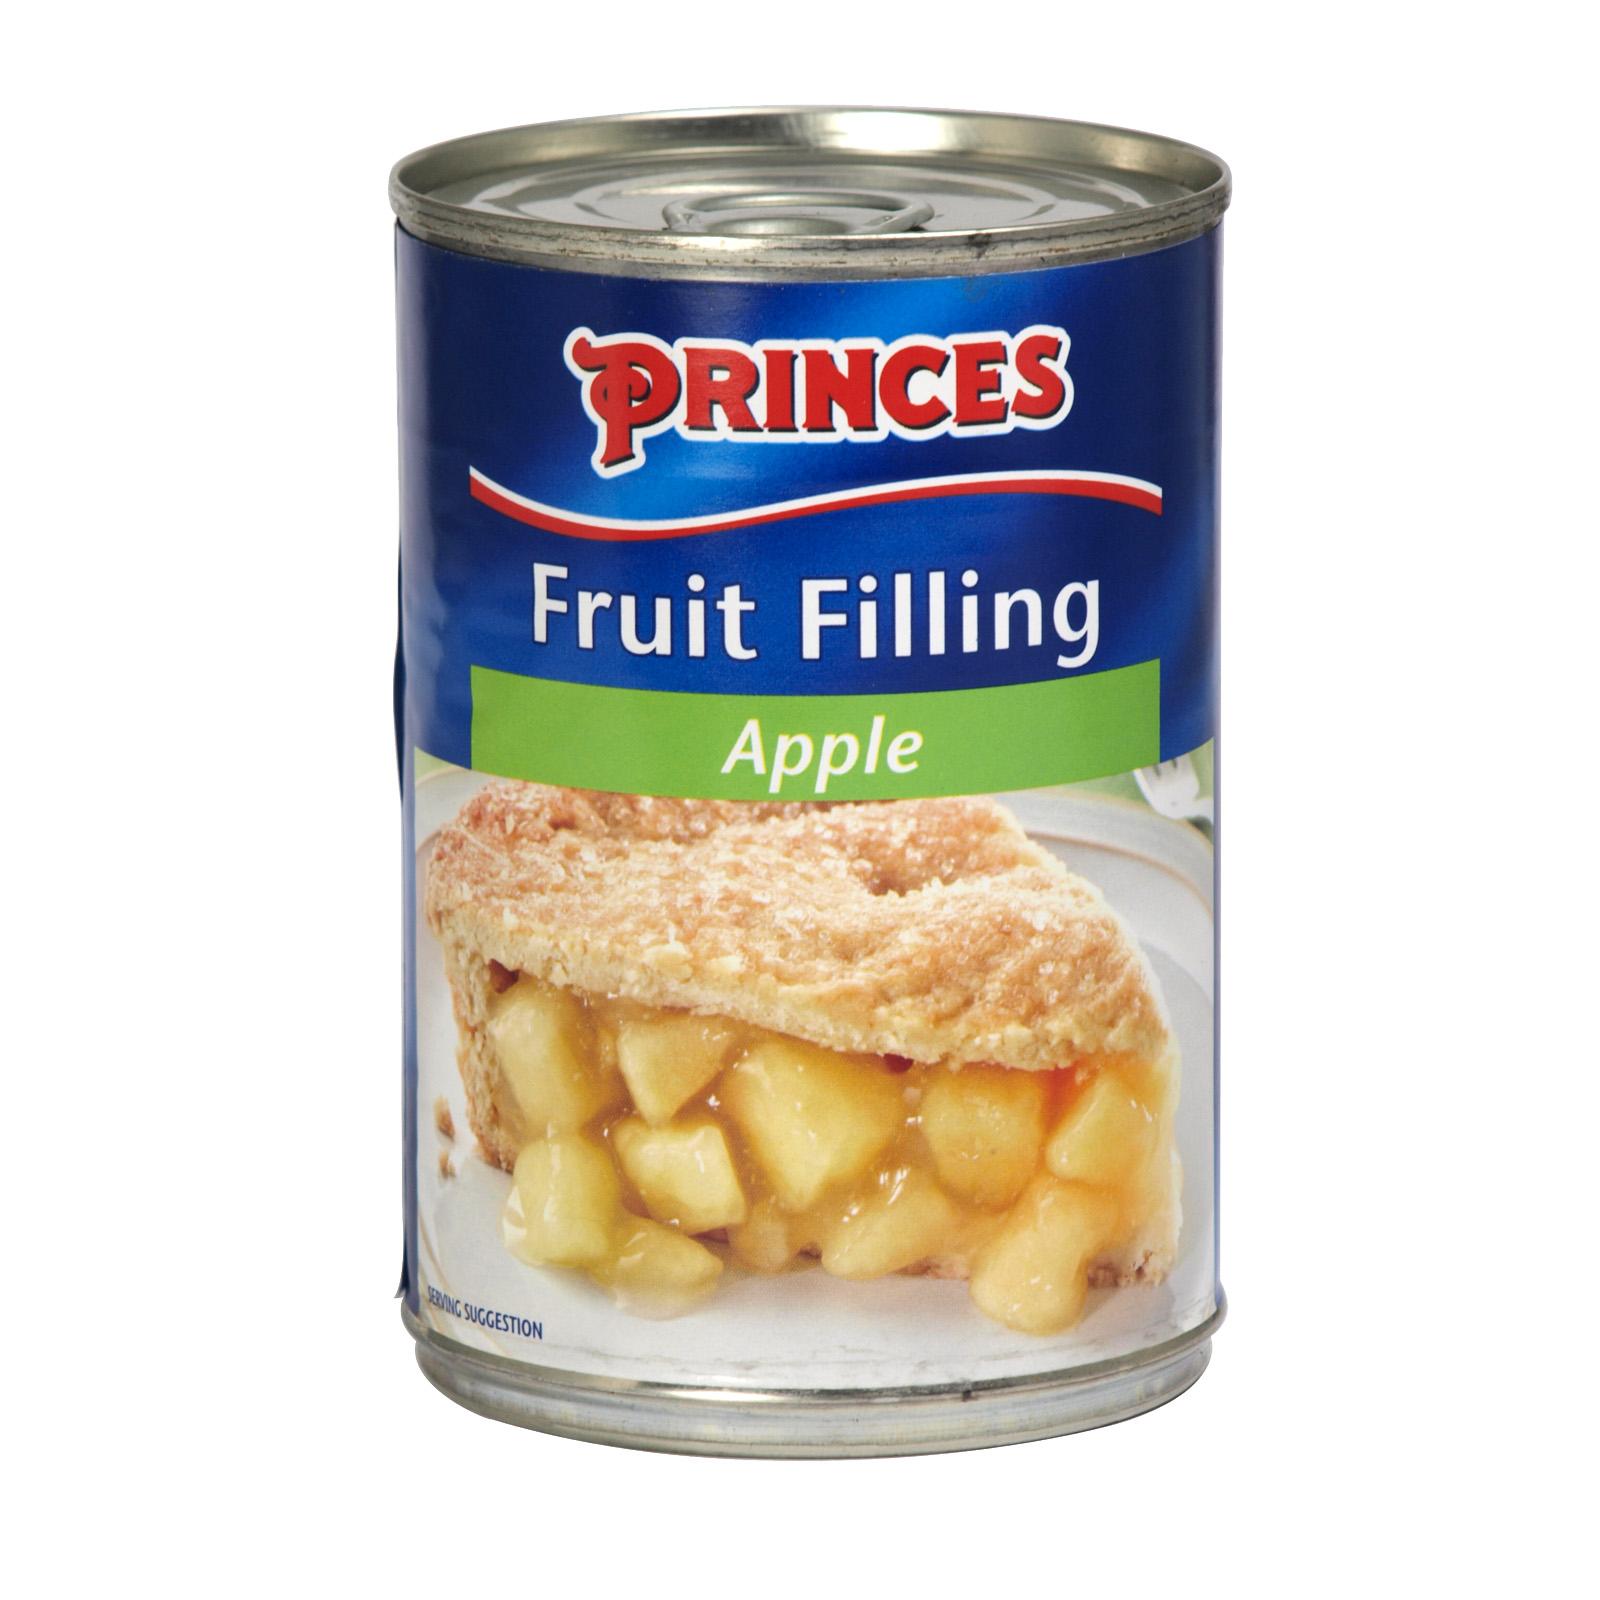 PRINCES FRUIT FILLING BRAMLEY APPLE 395GM X6